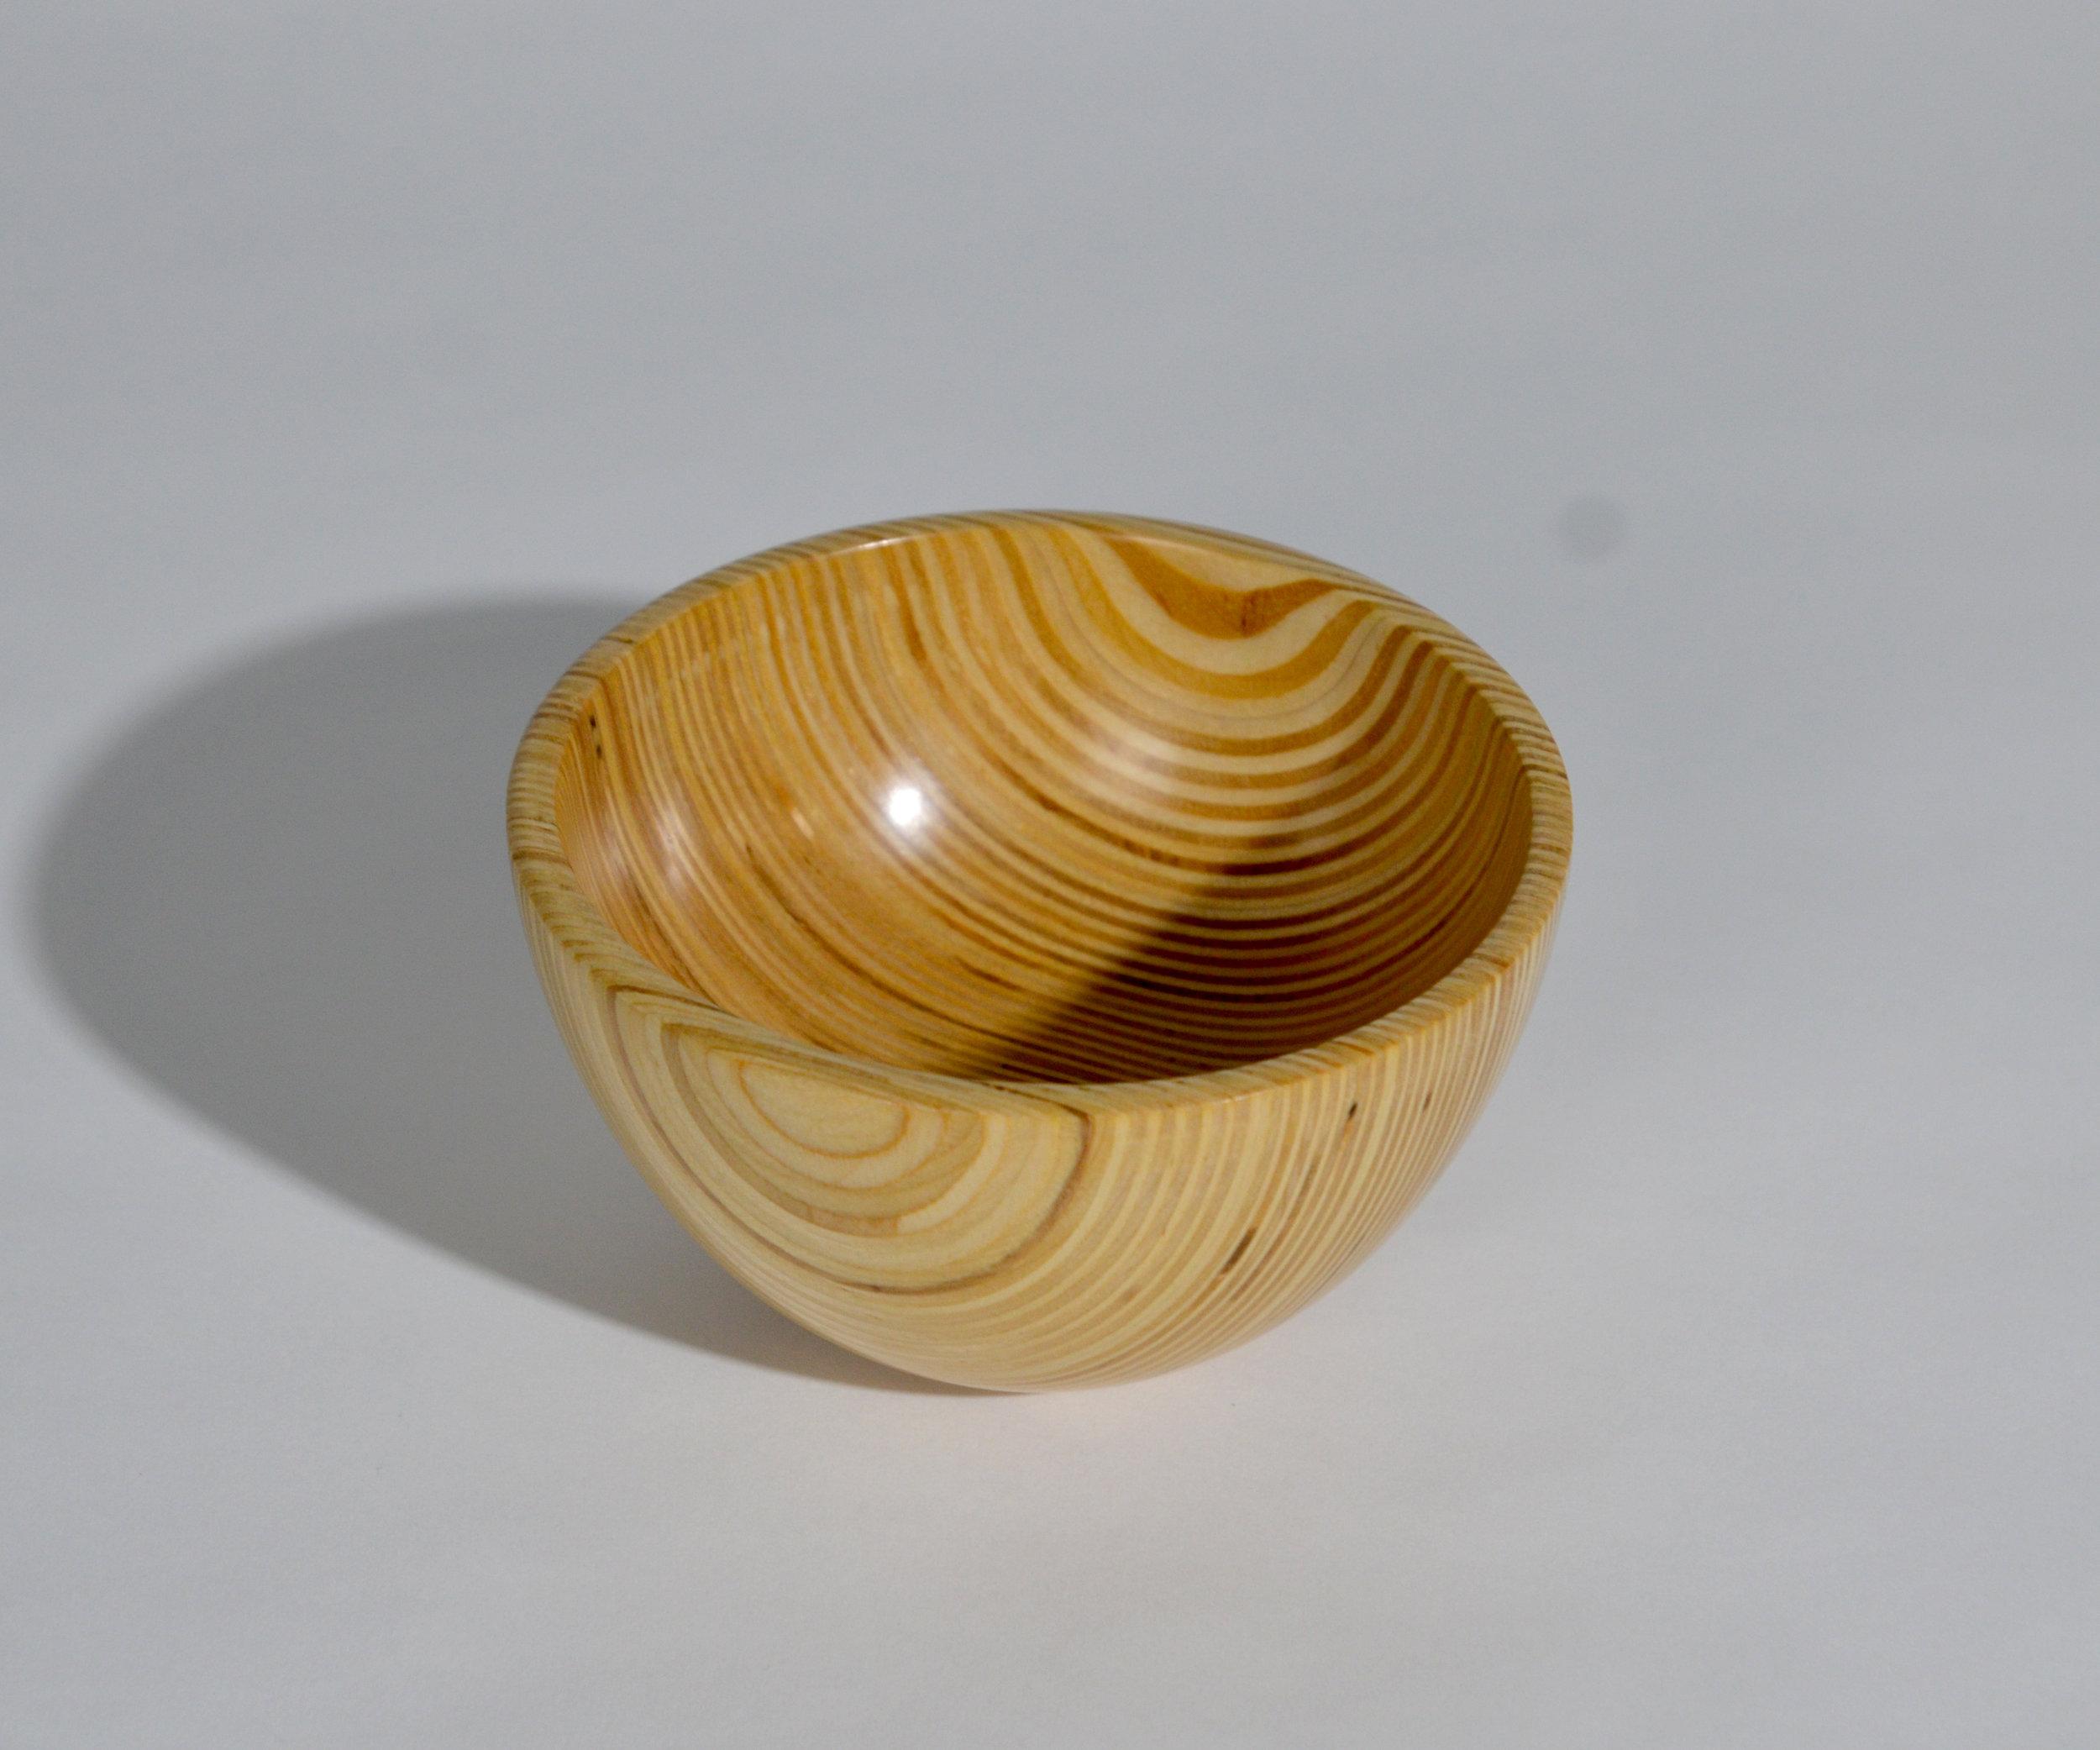 ply-bowl 2.JPG